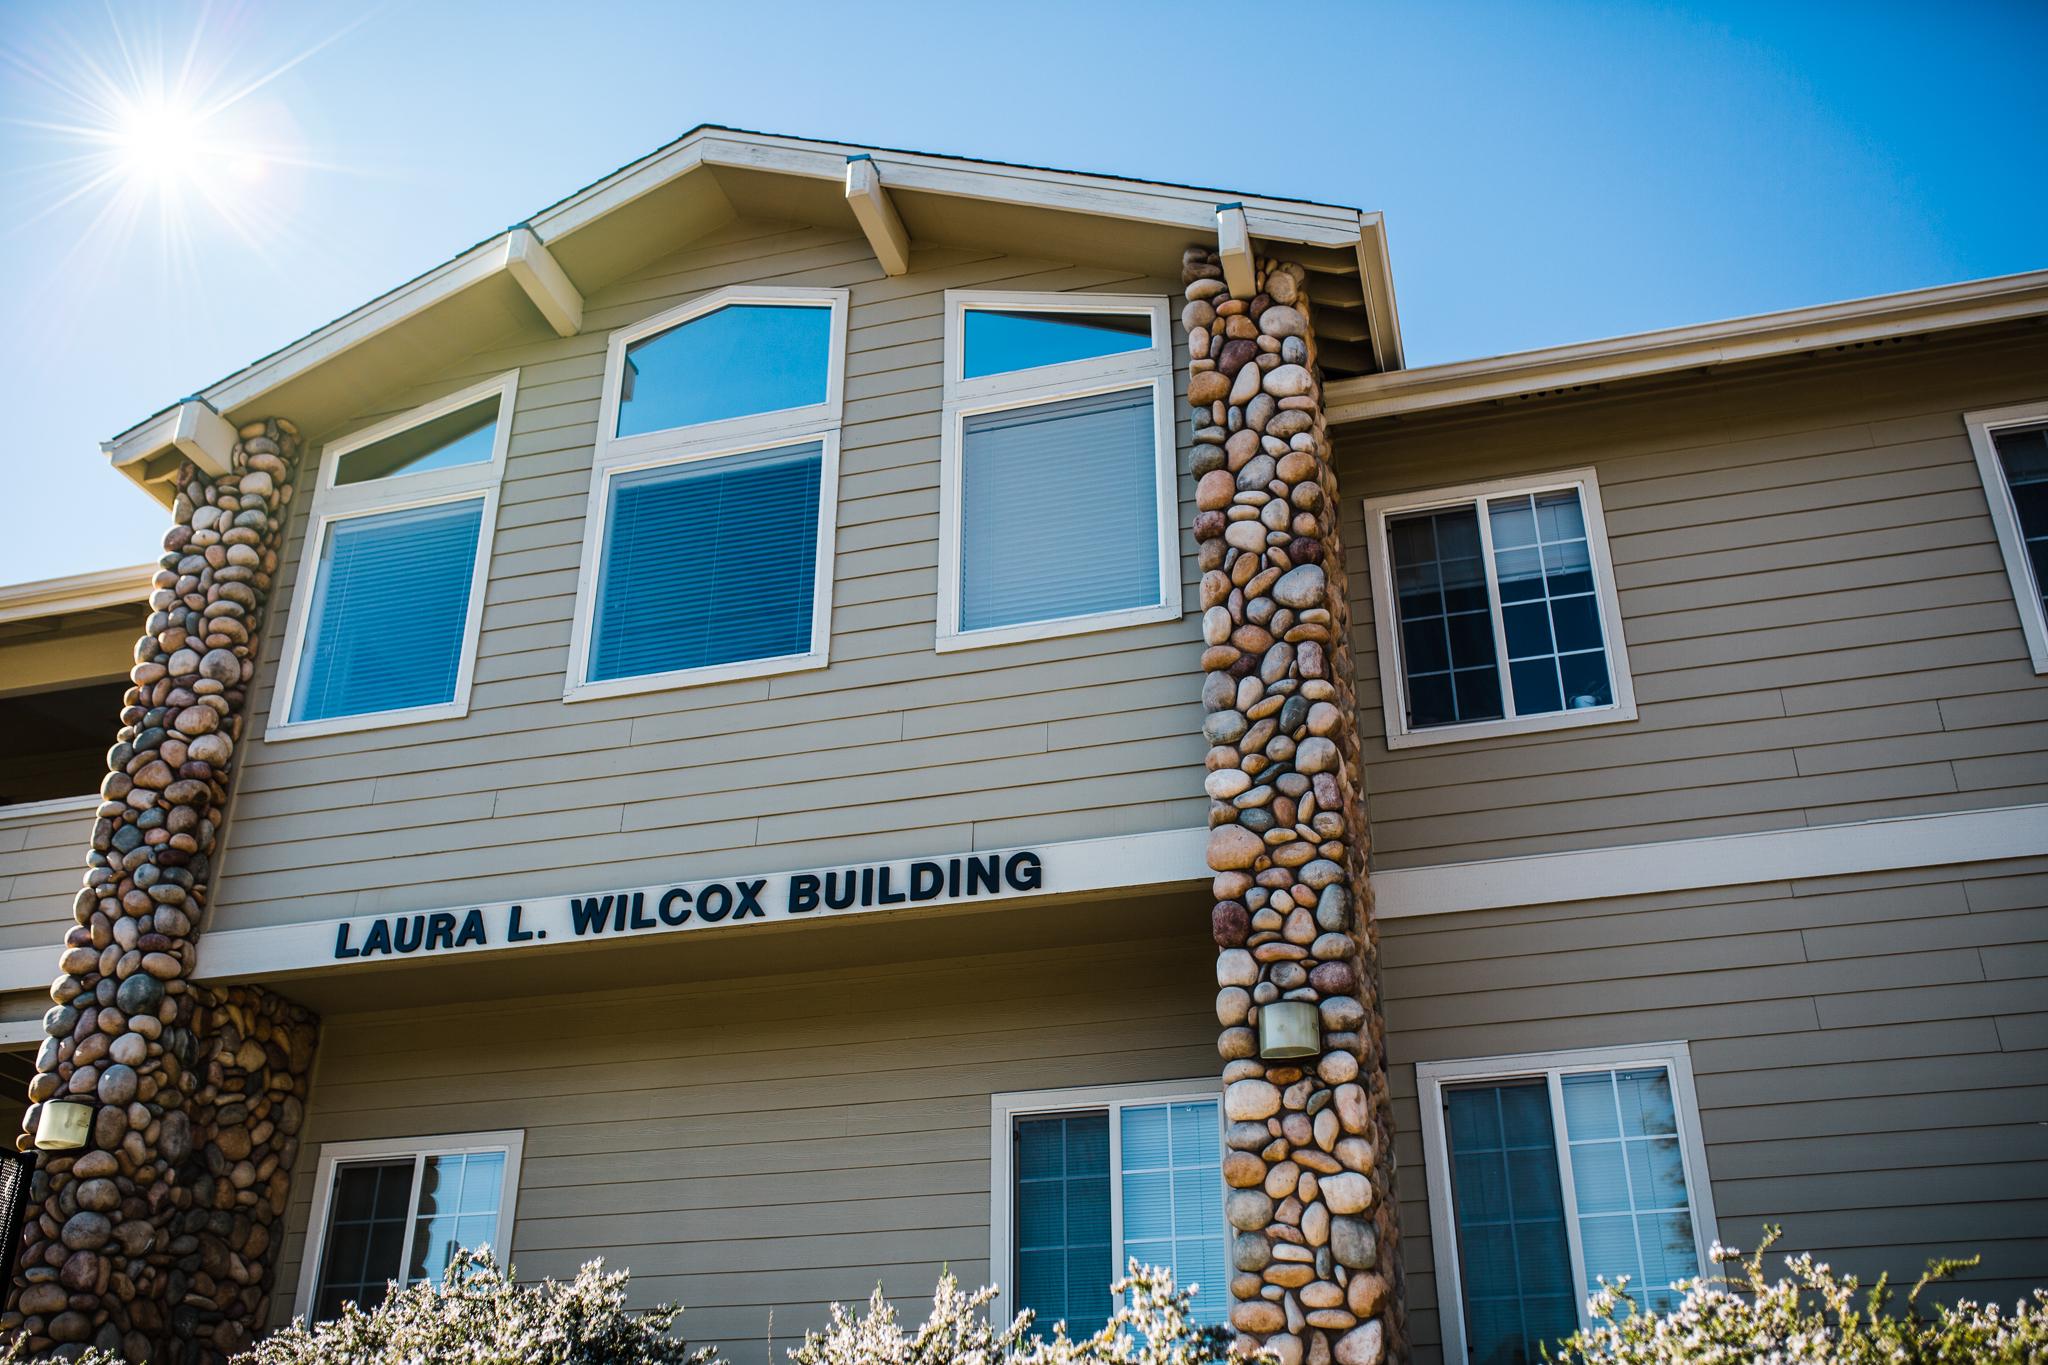 Laura L. Wilcox Building